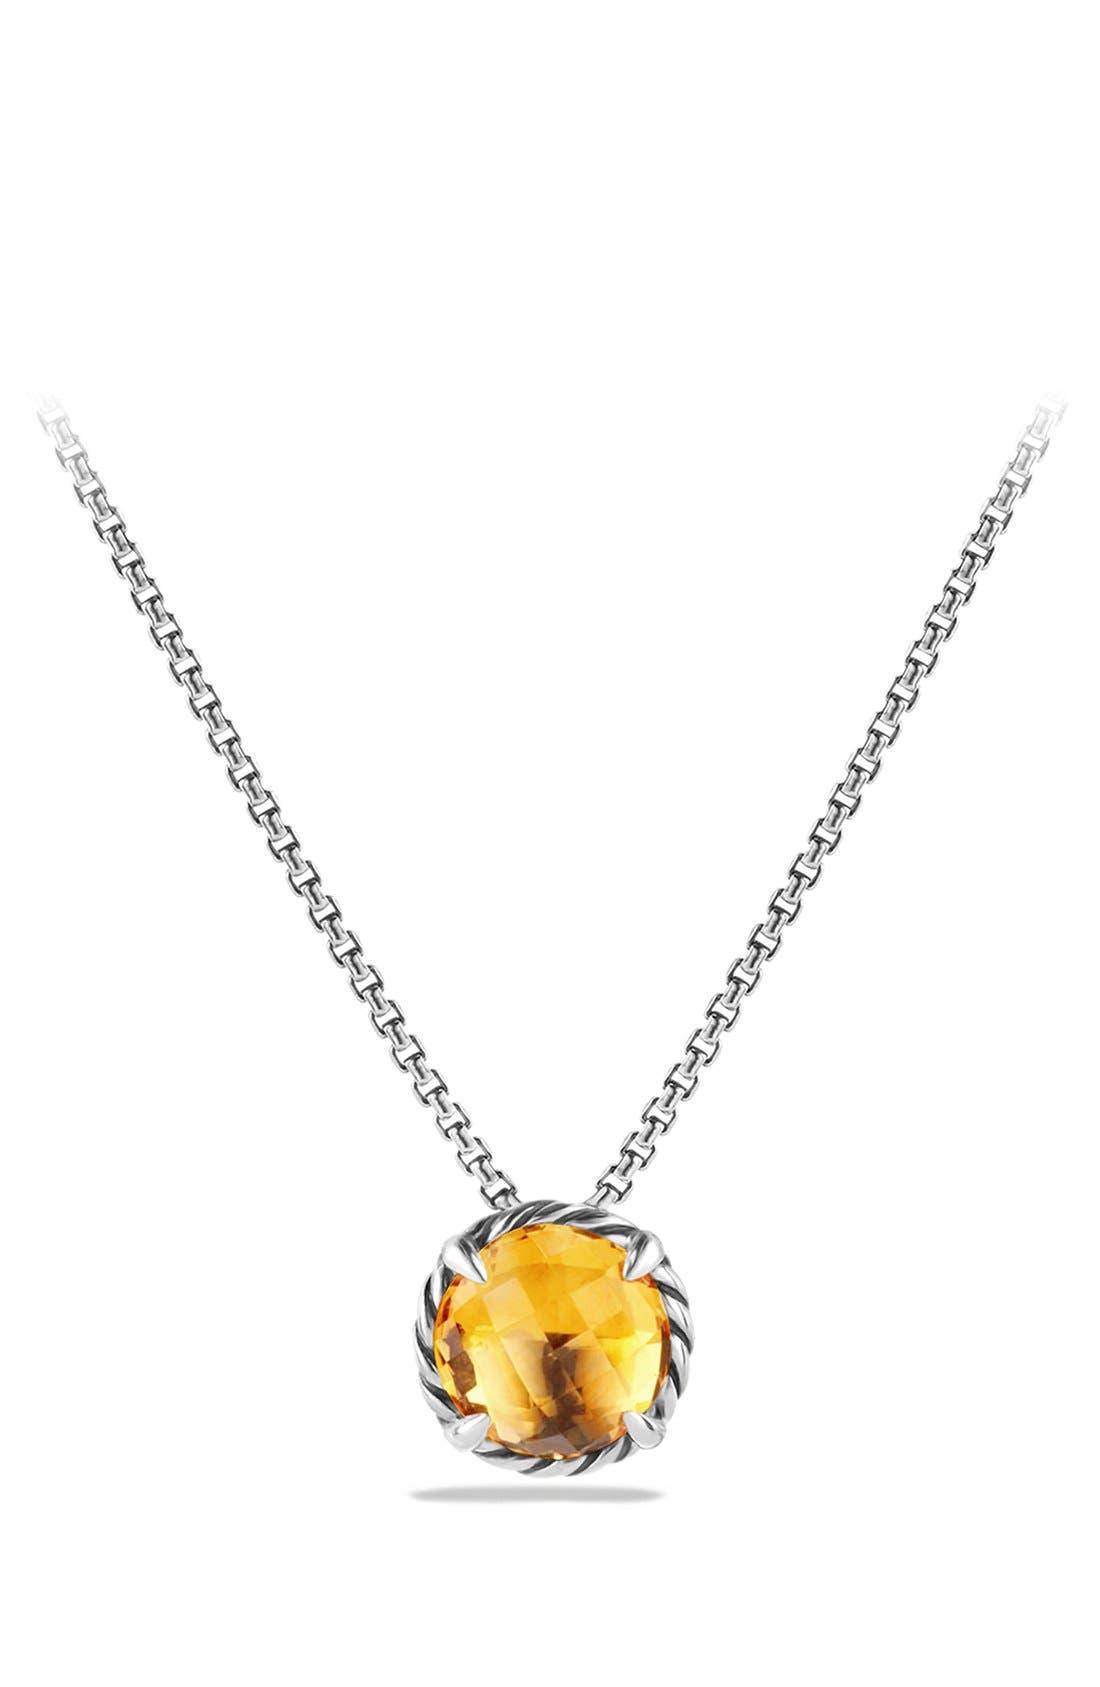 david yurman pendant necklace